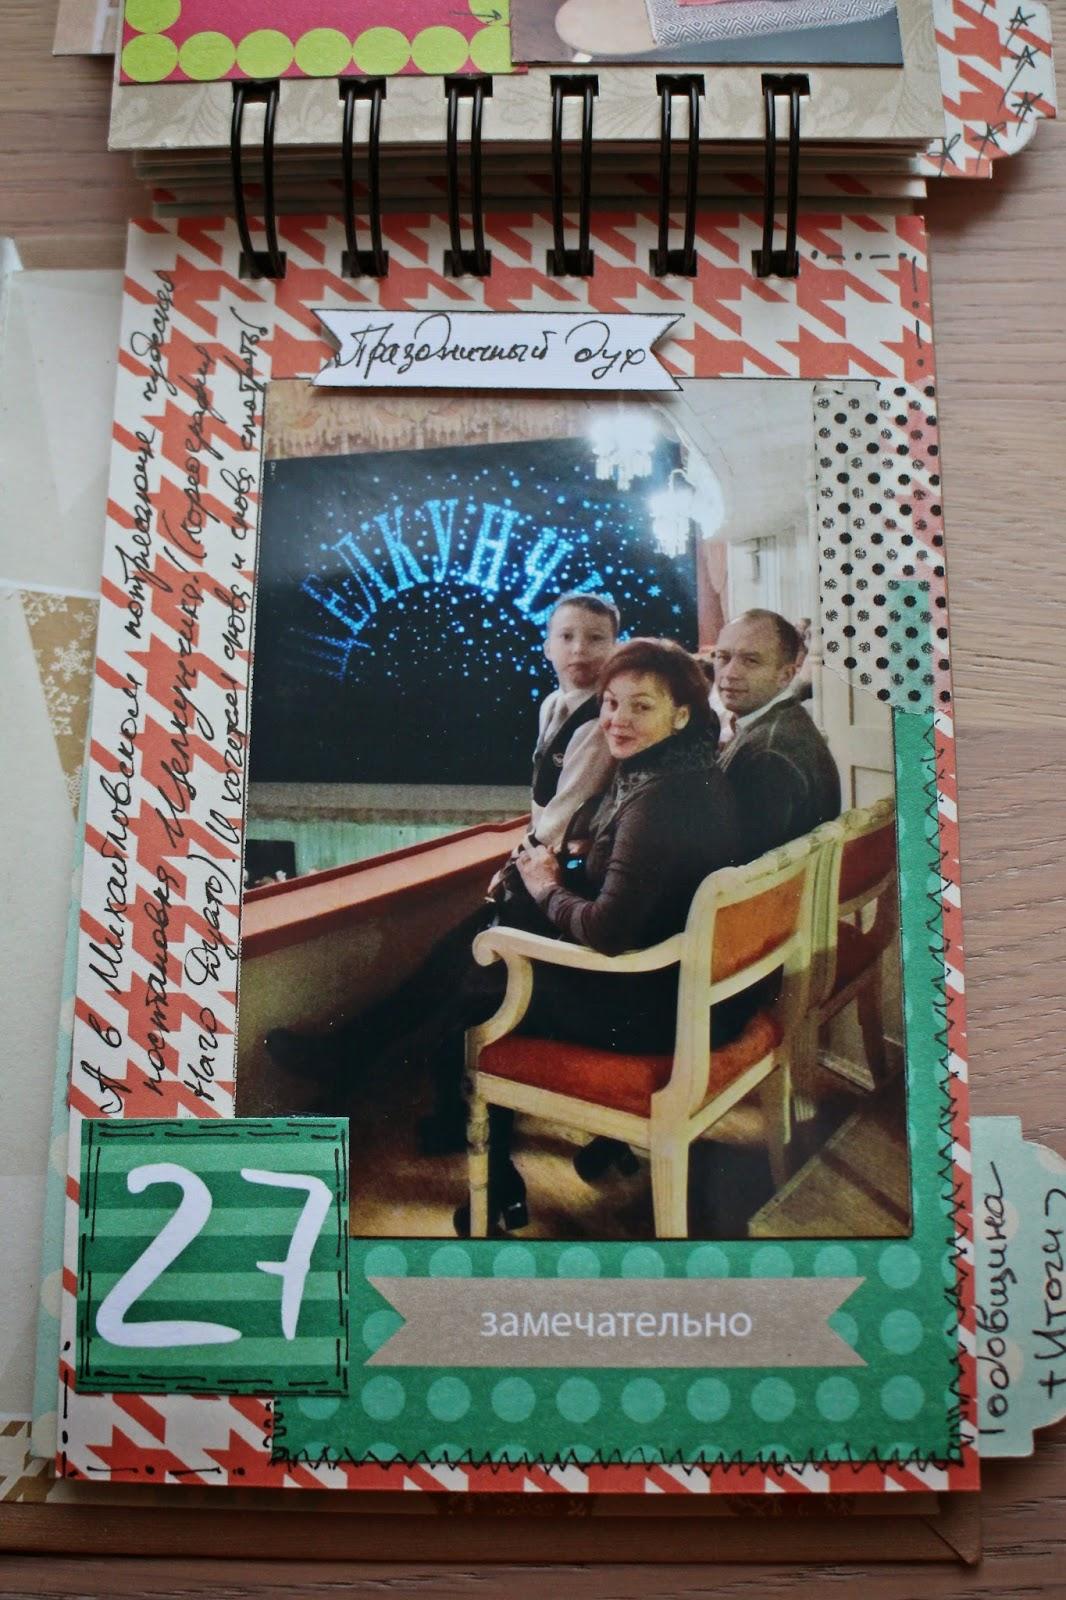 December Daily DD winter scrapbooking зима скрапбукинг Декабрьский Дневник ДД hamster-sensey